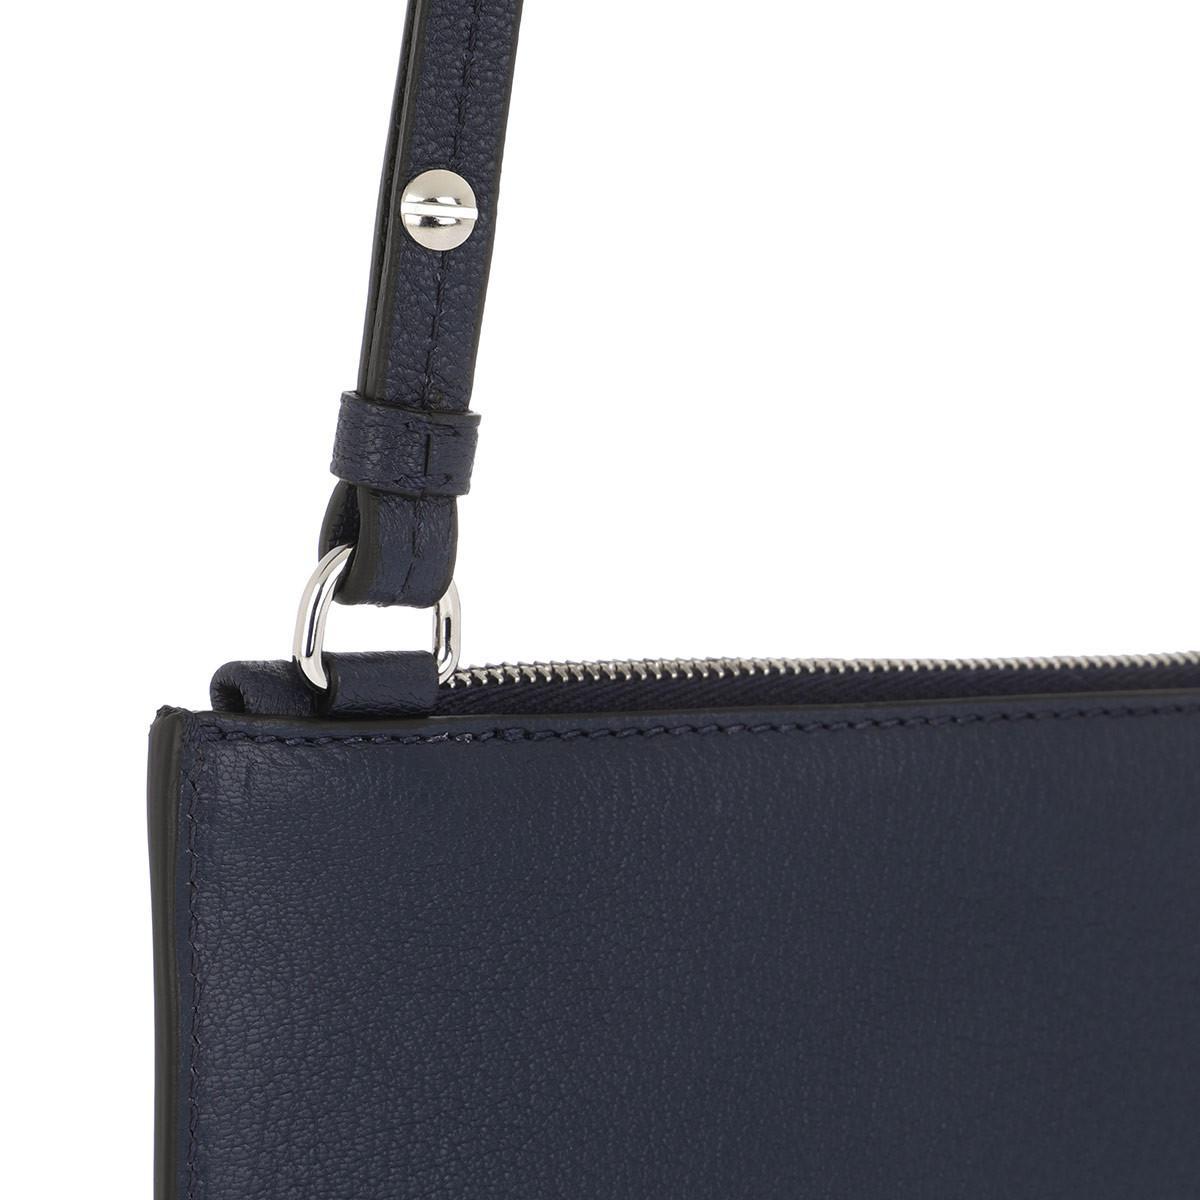 Givenchy Leather Slg Mini Crossbody Bag Night Blue